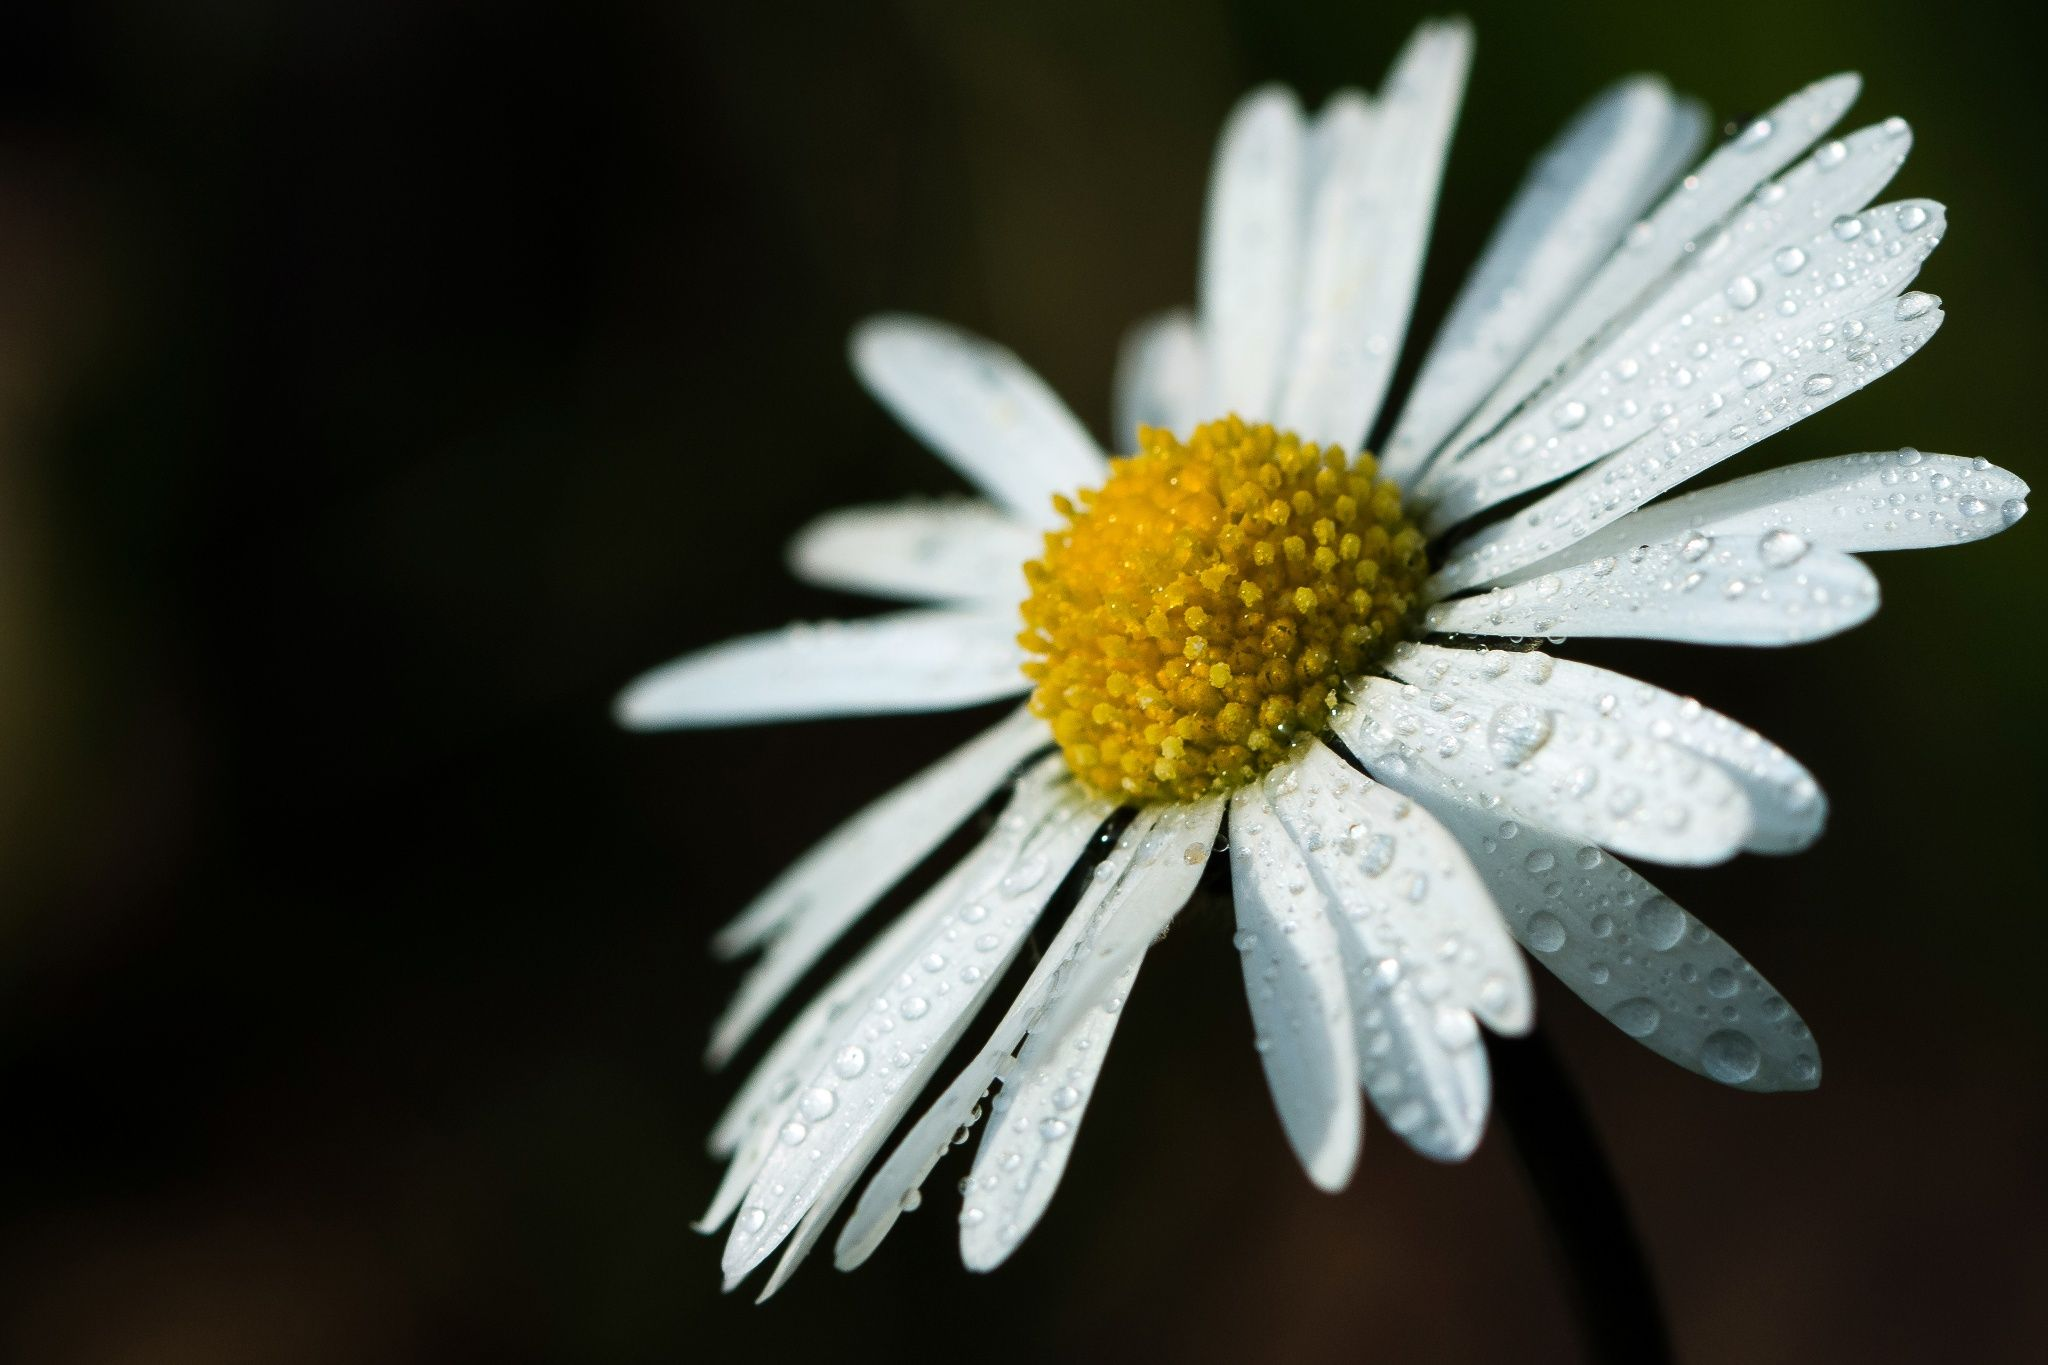 flower*** by David Parenteau on 500px